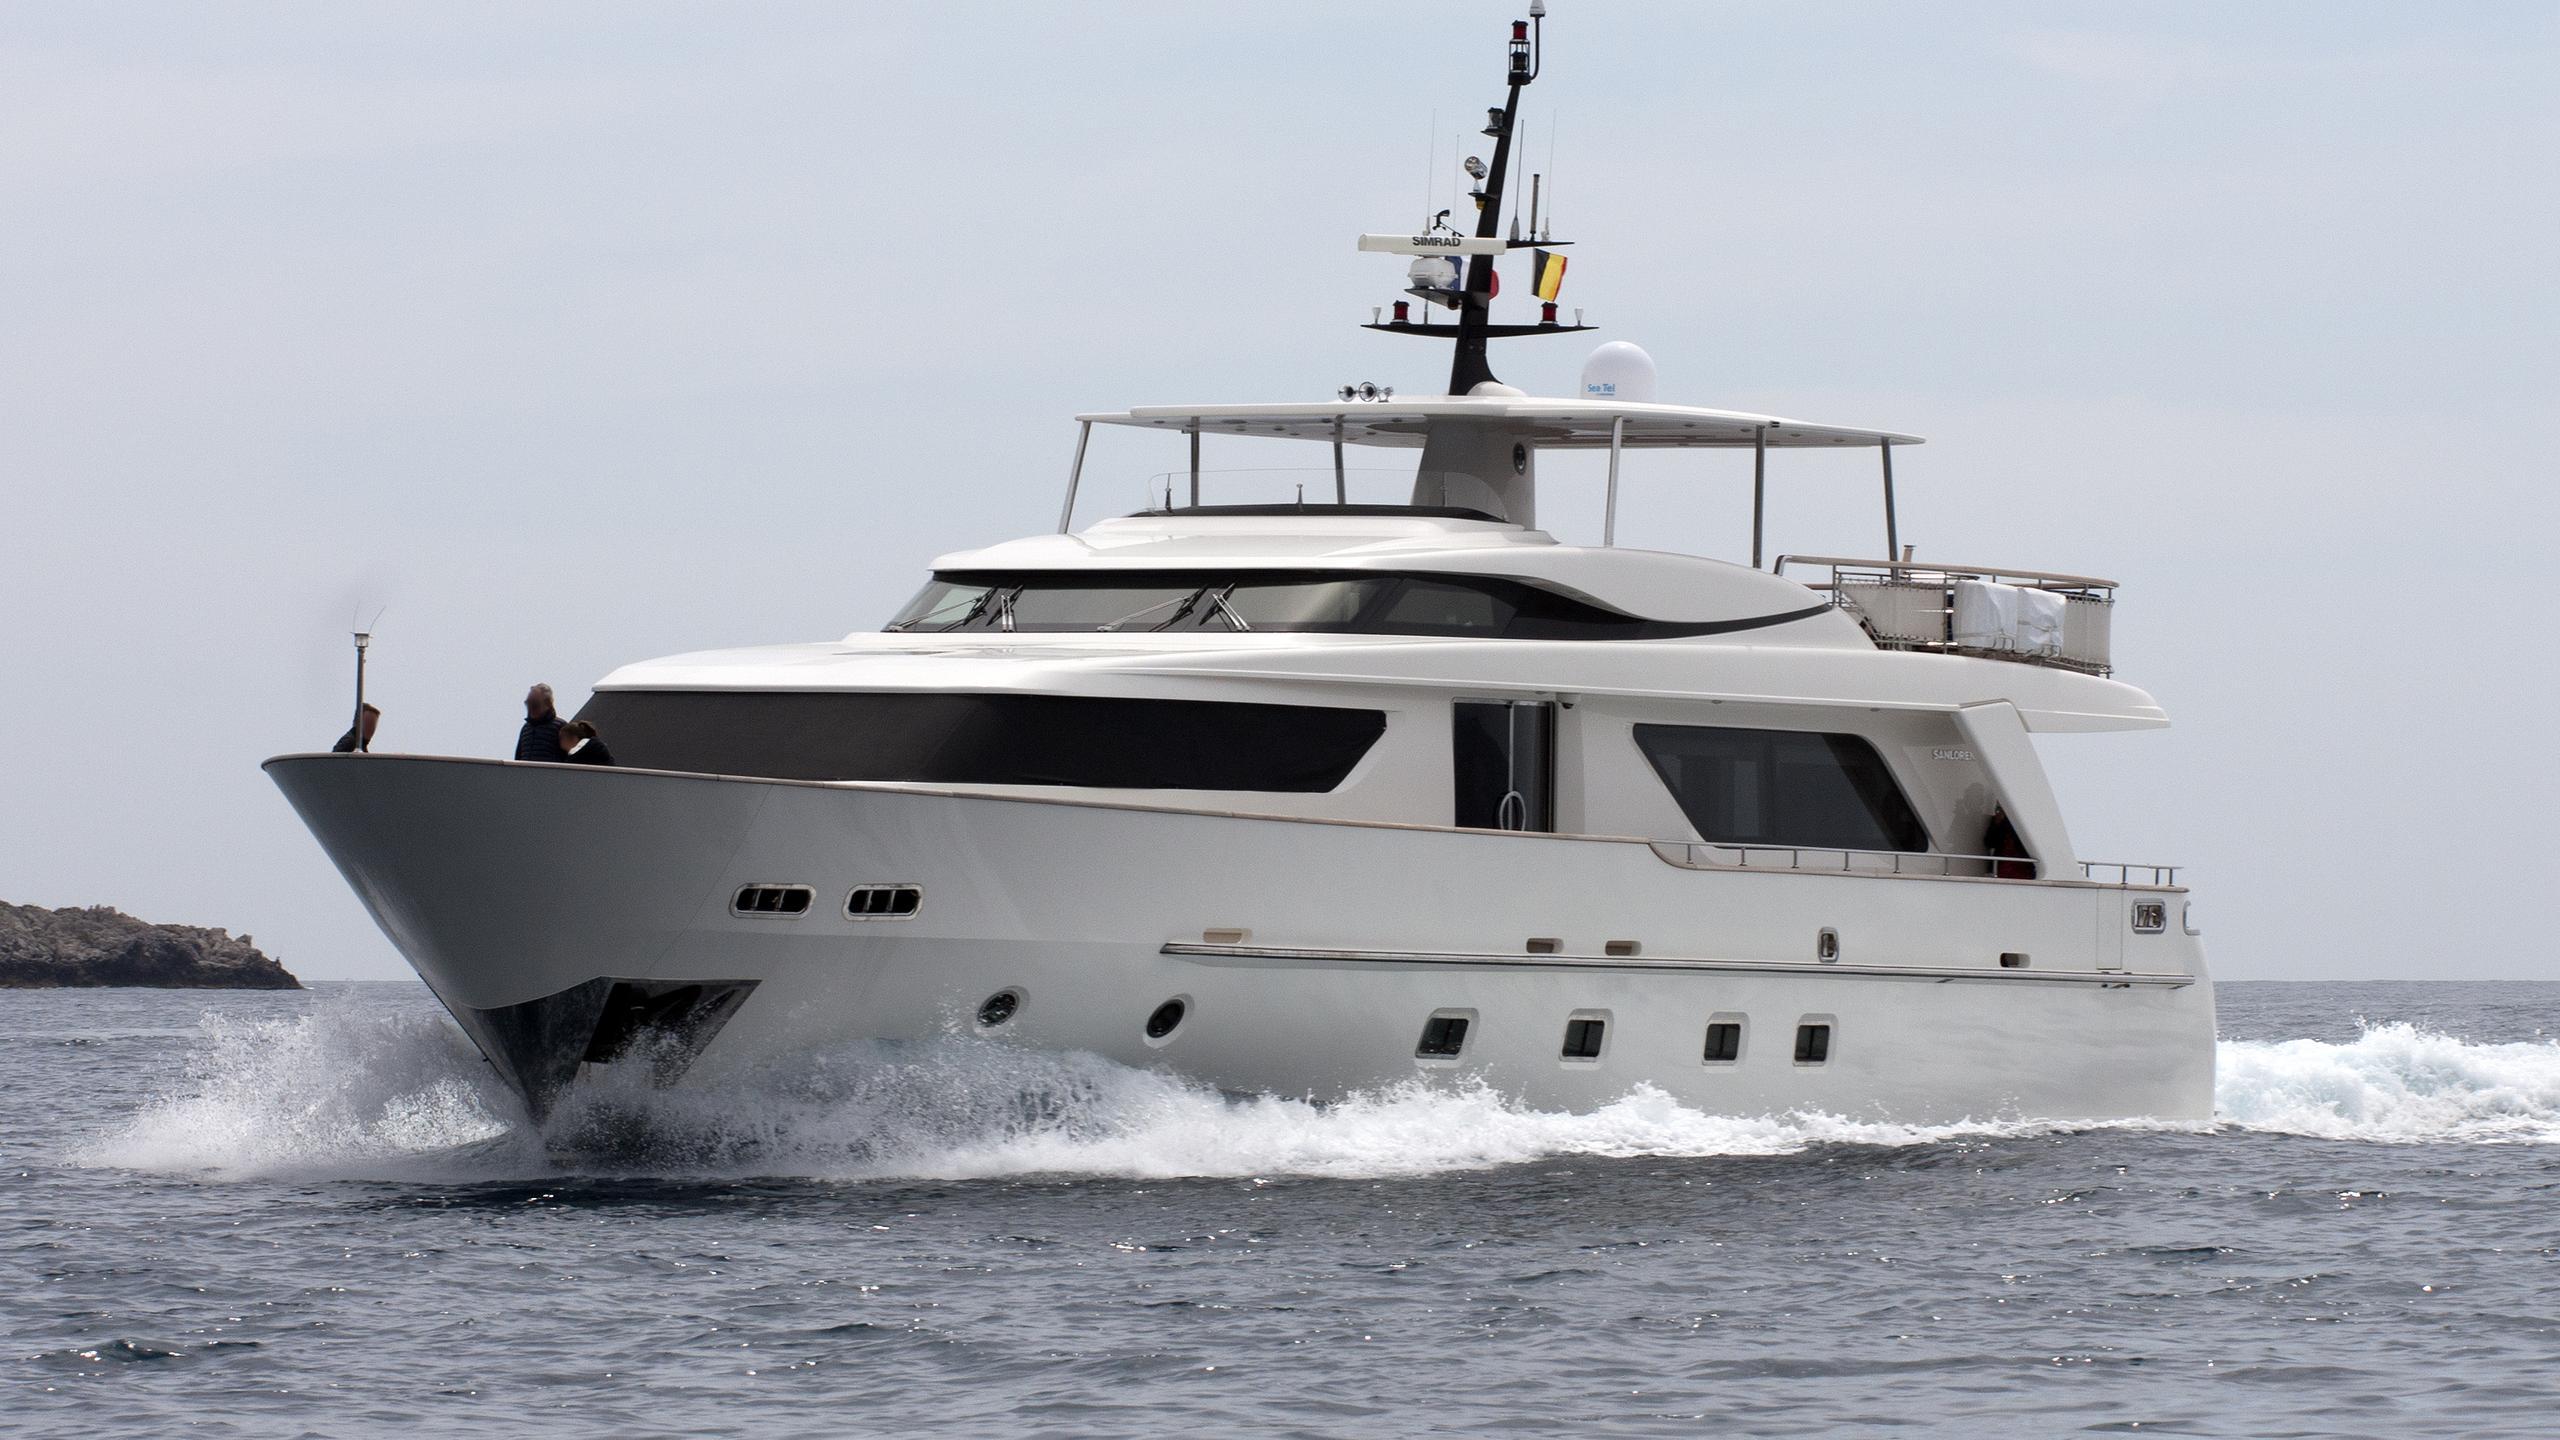 mia-rocca-ix-yacht-exterior